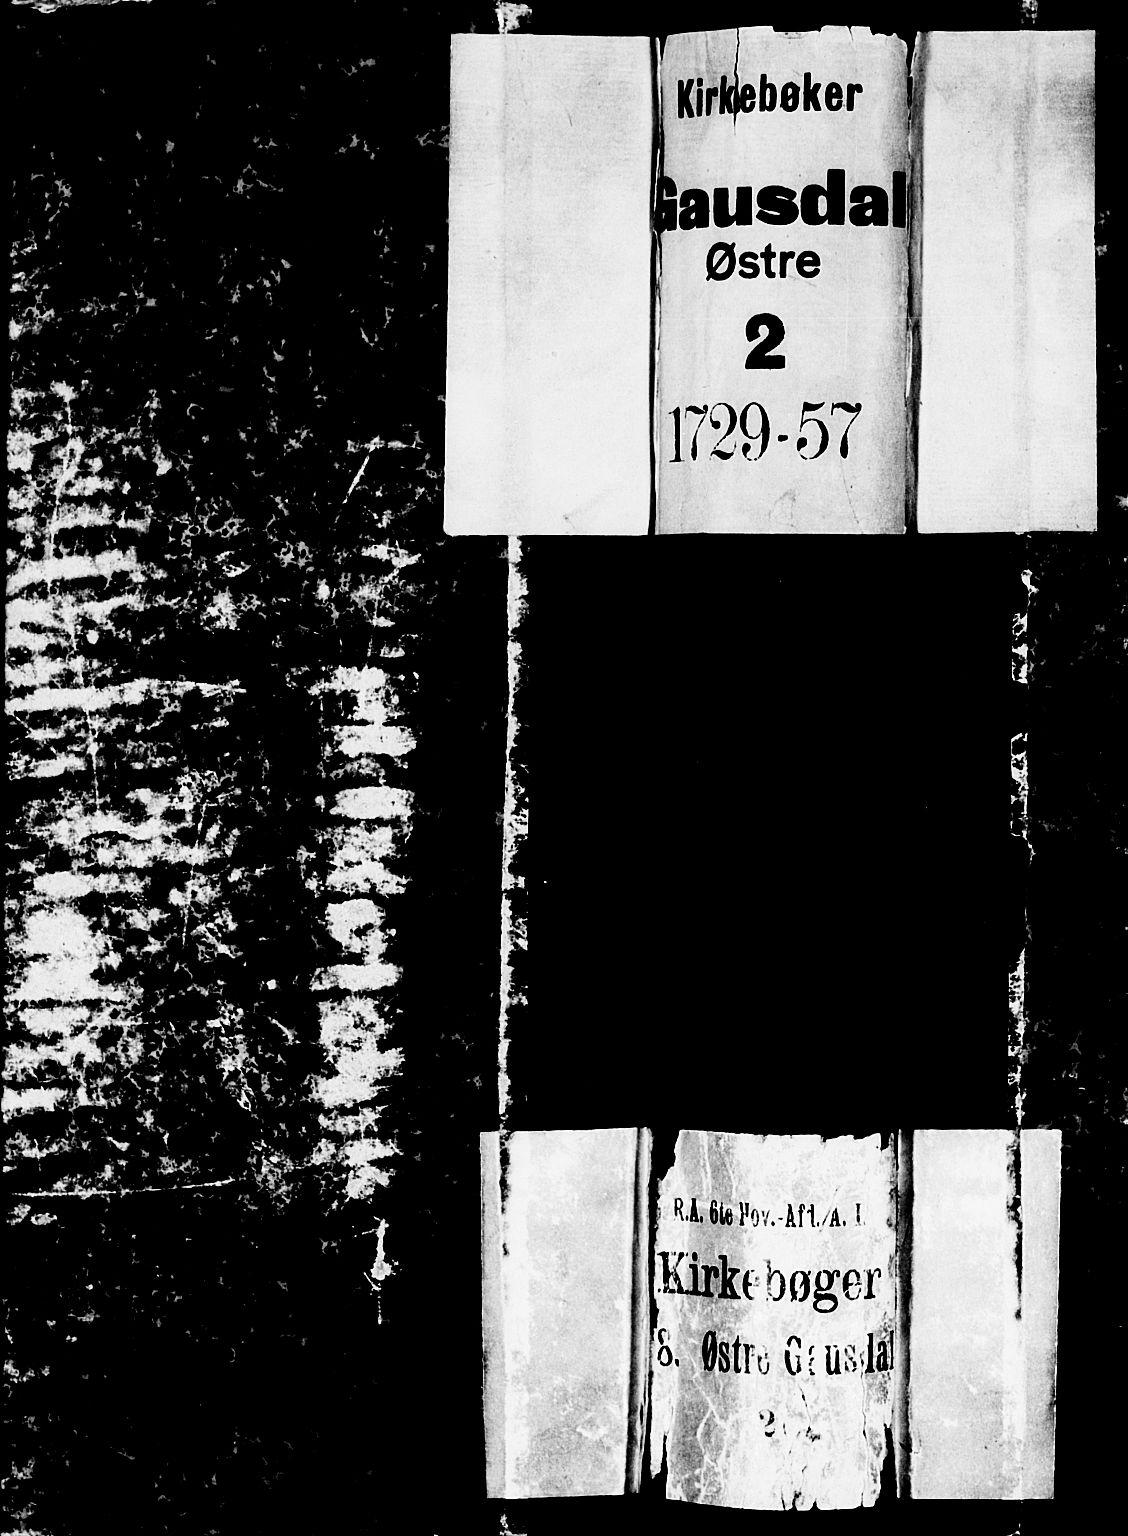 SAH, Gausdal prestekontor, Ministerialbok nr. 2, 1729-1757